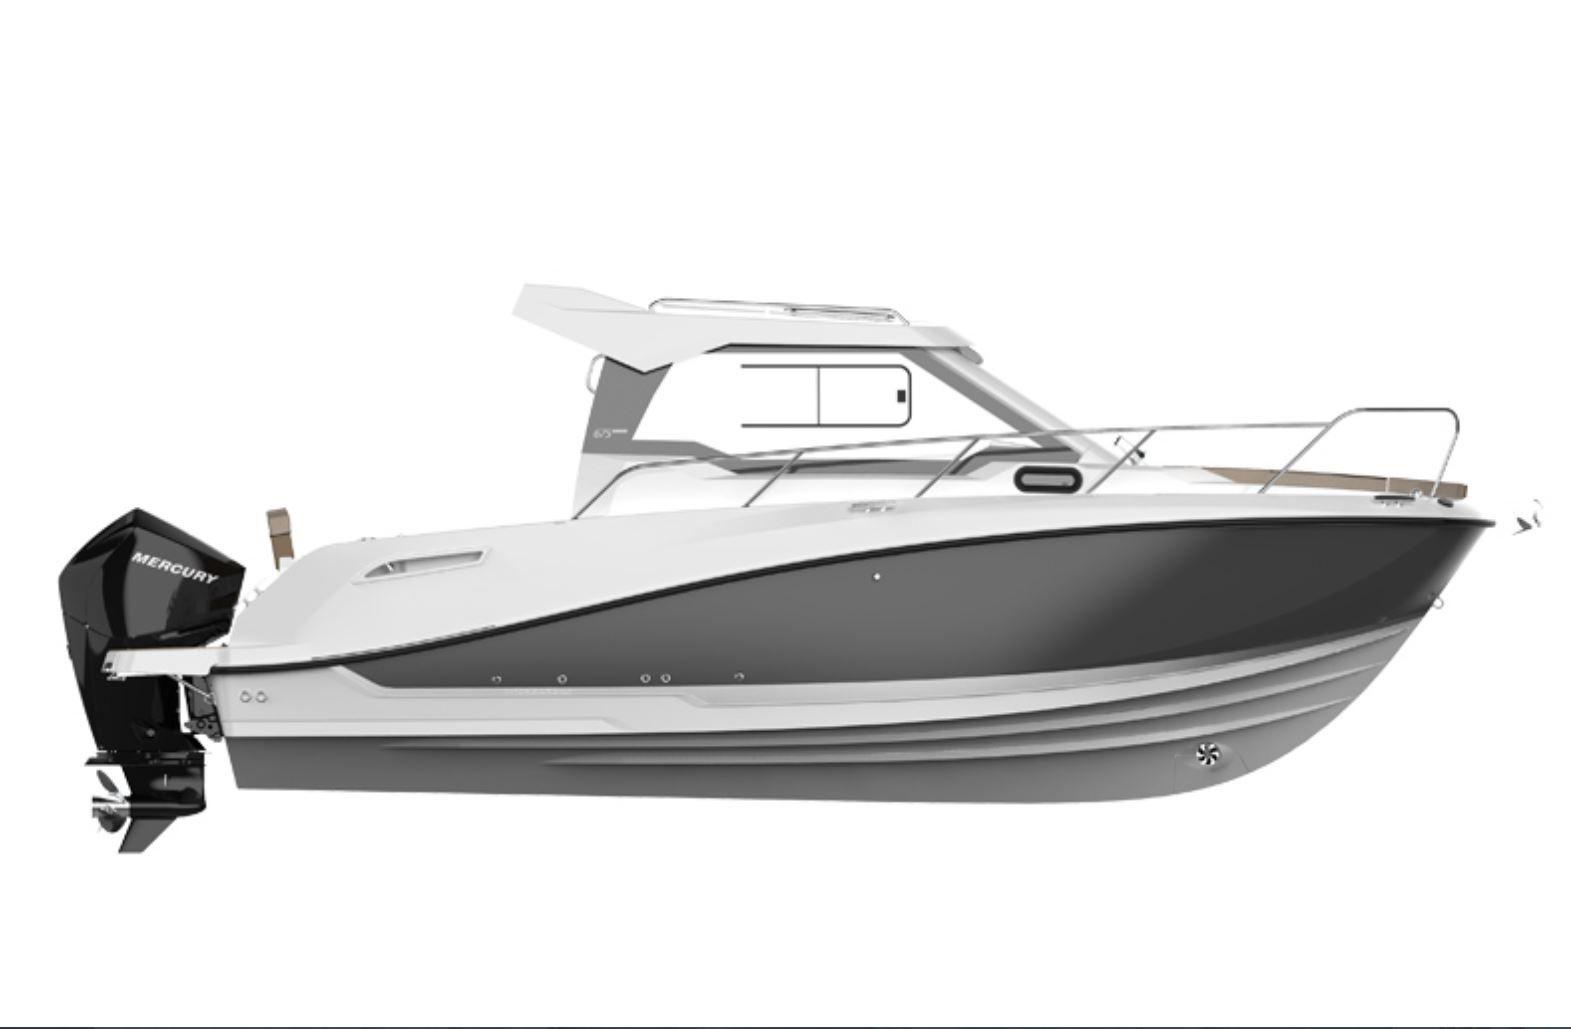 Bootfahren - Quicksilver kündigt die Ankunft des Quicksilver 675 Weekend an